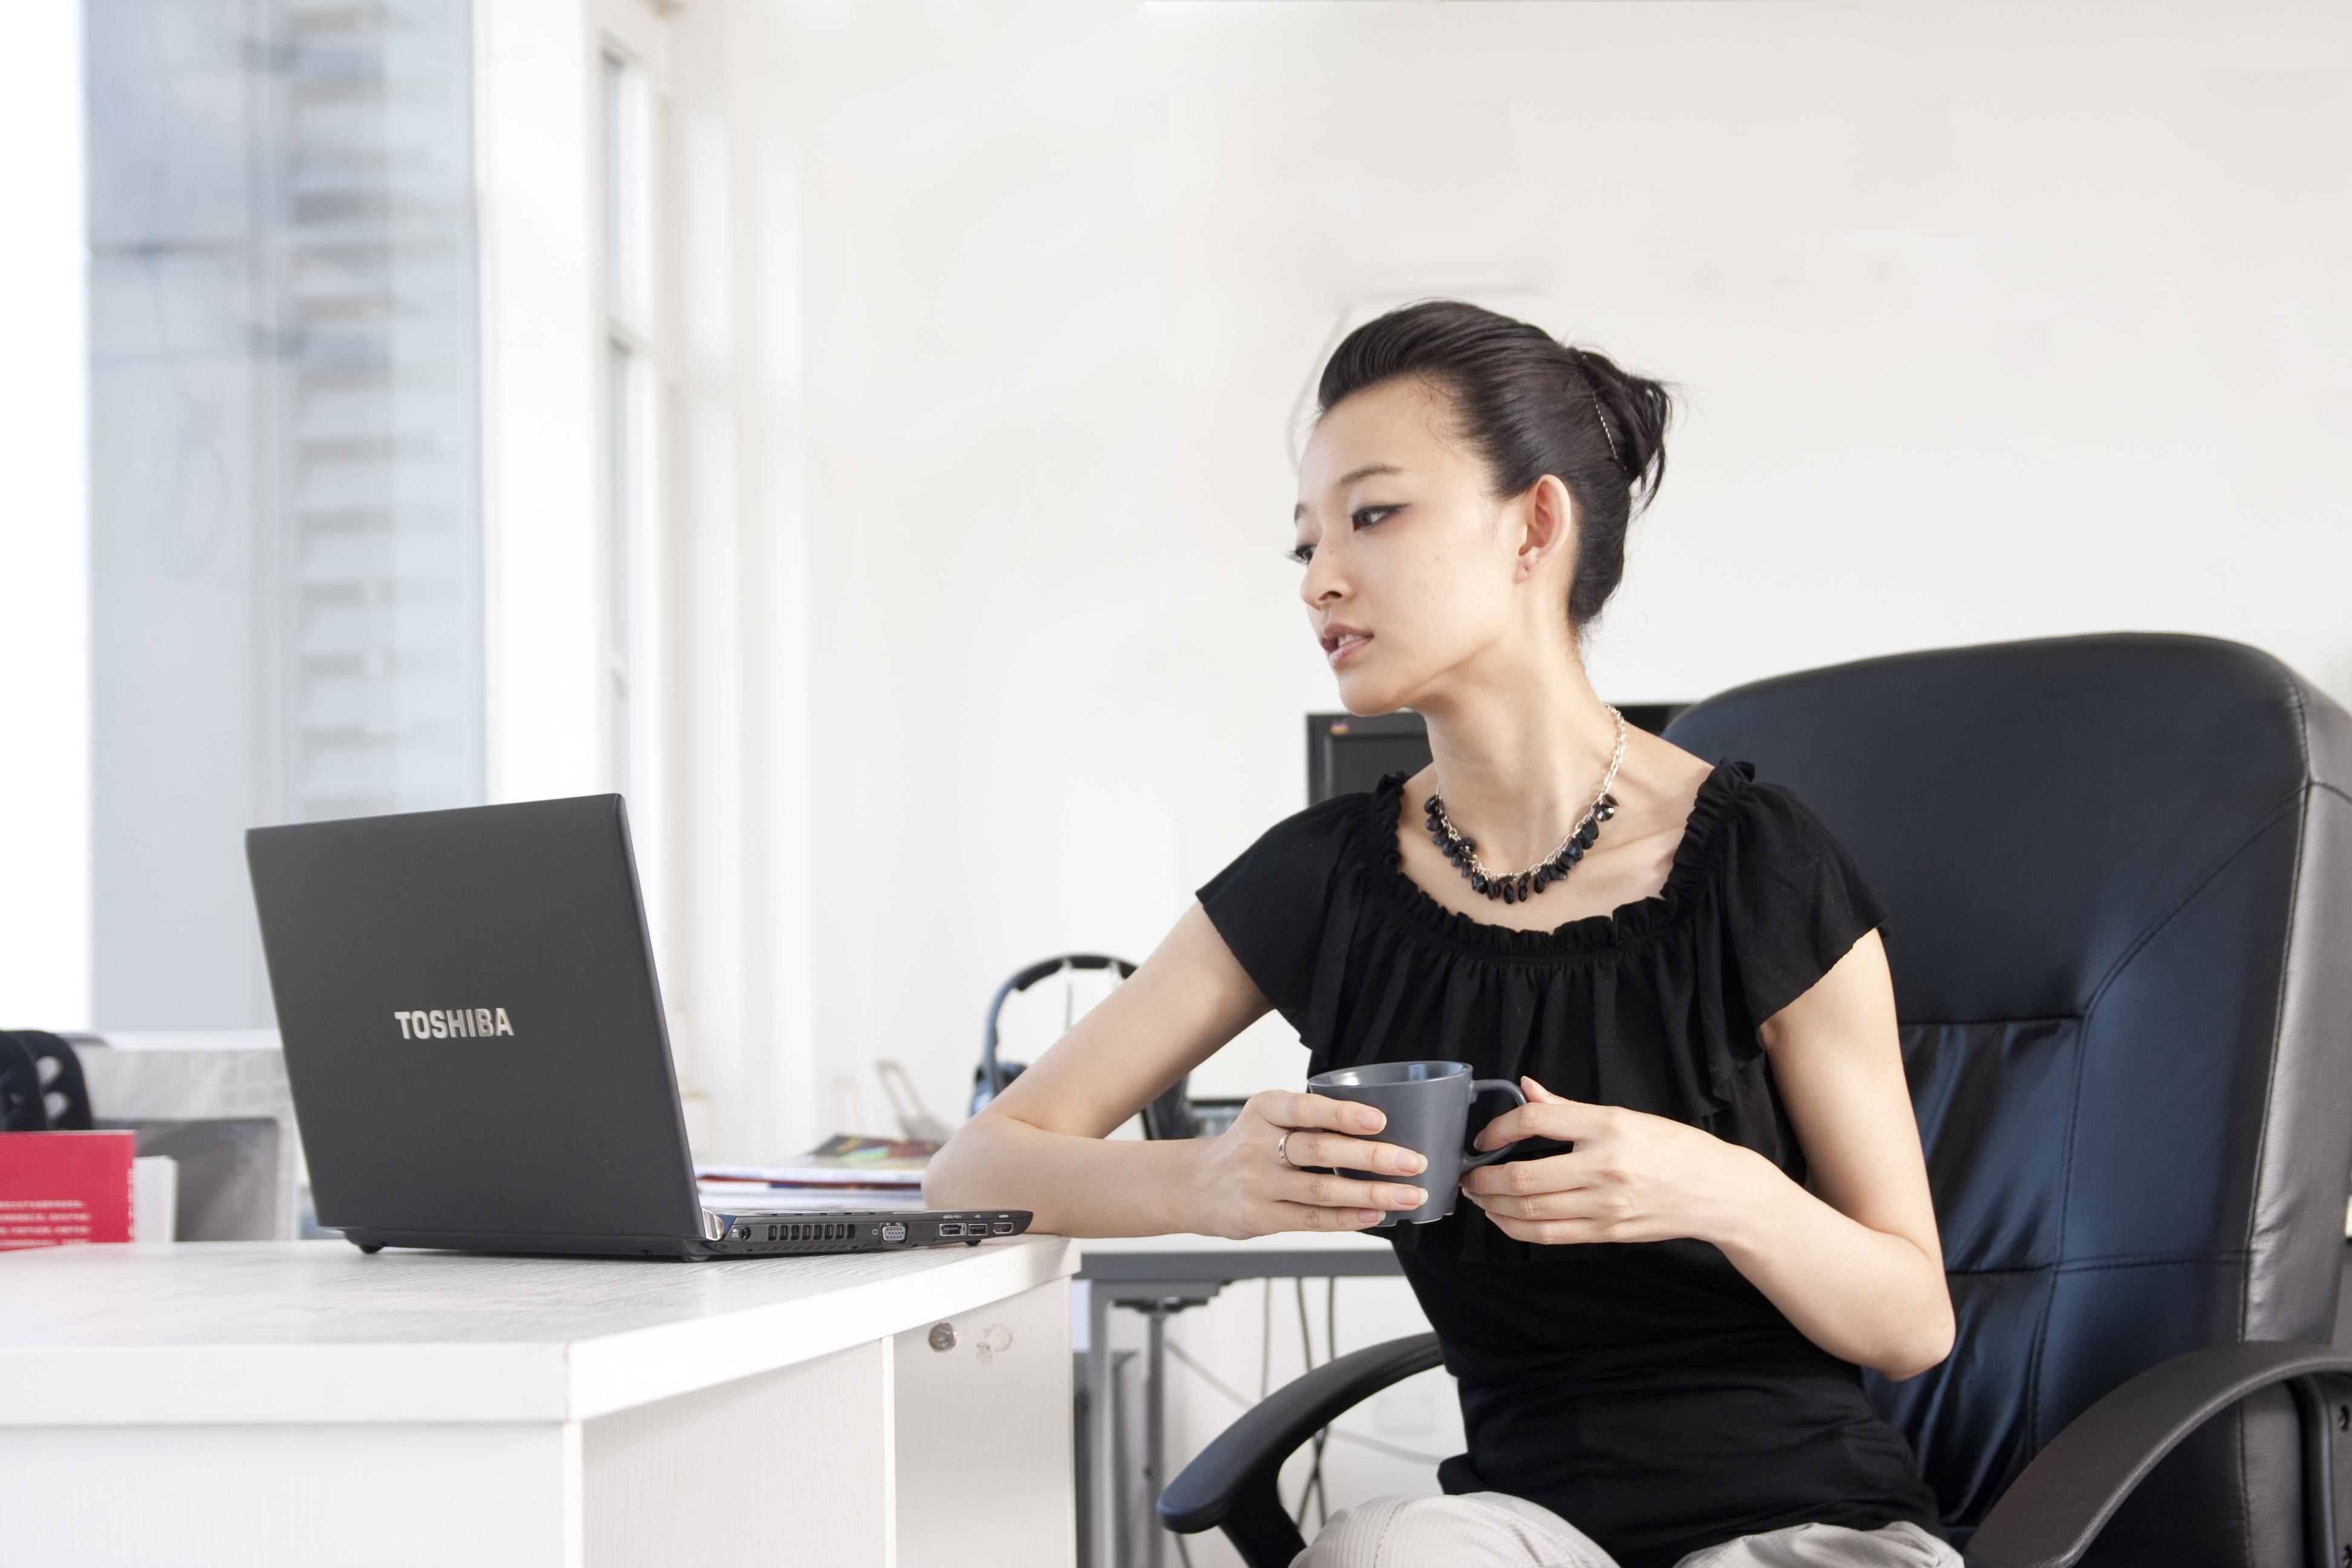 女老板图片_WWW.JXZHLYW.COM